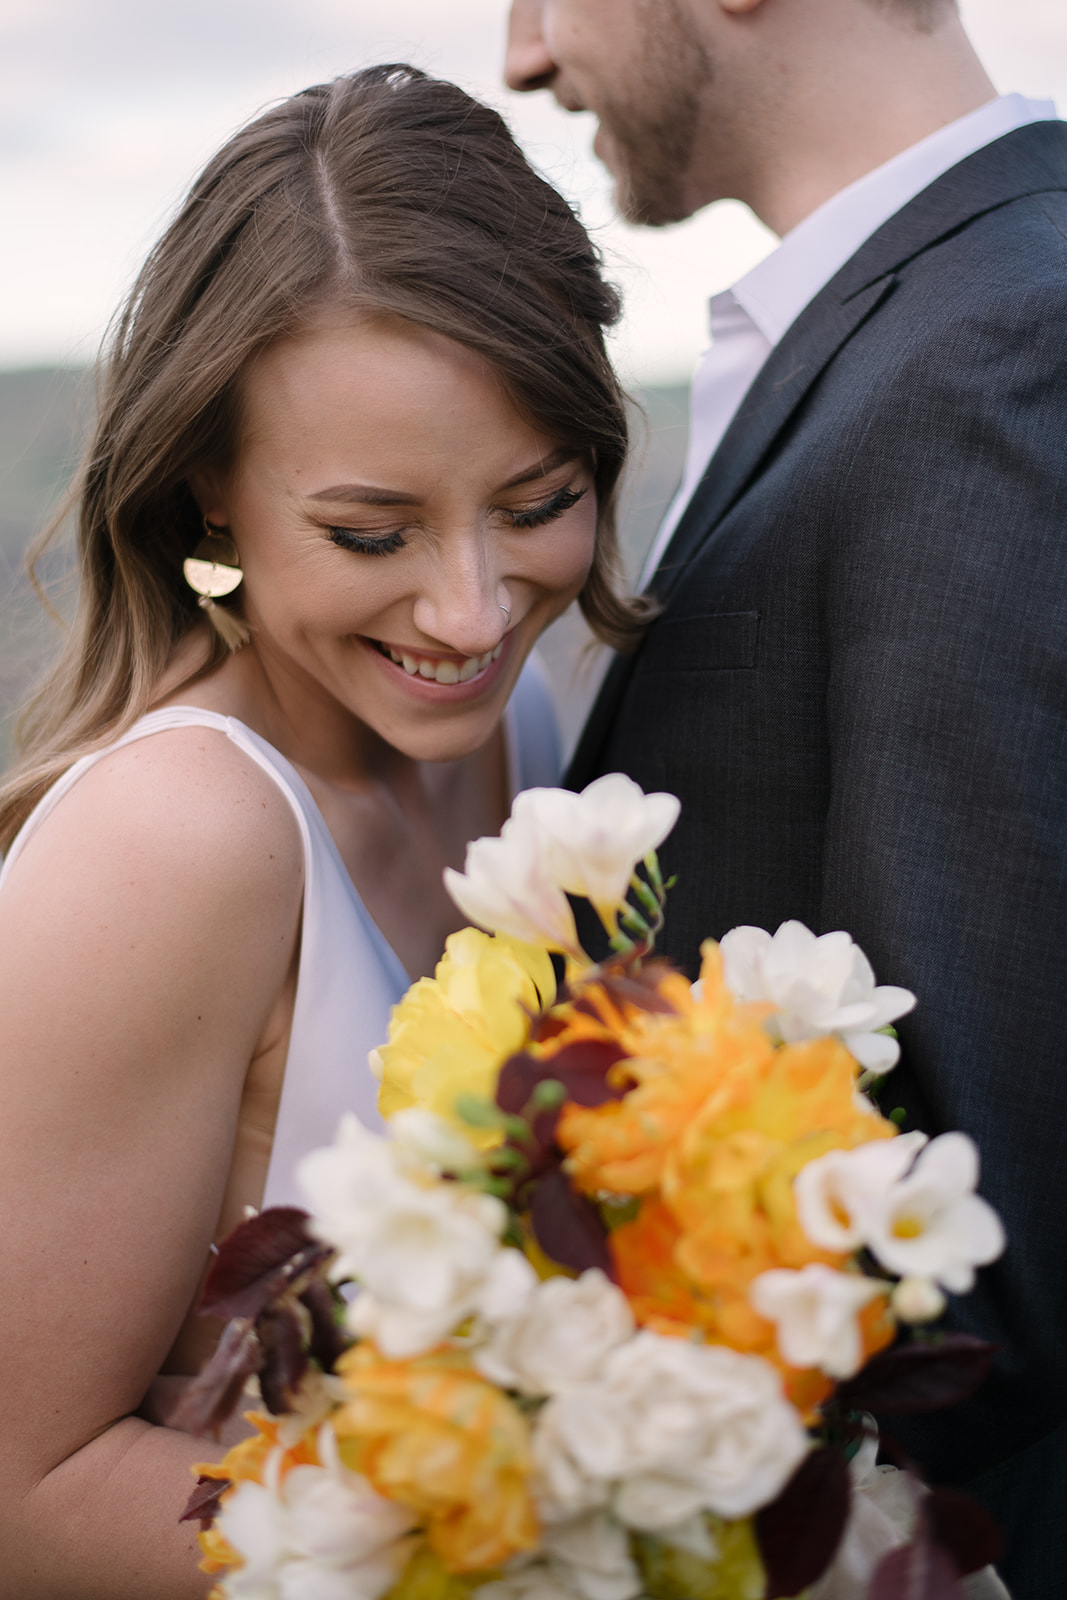 kamea_events_wedding_planner_portland_deus_amor_9671.jpg